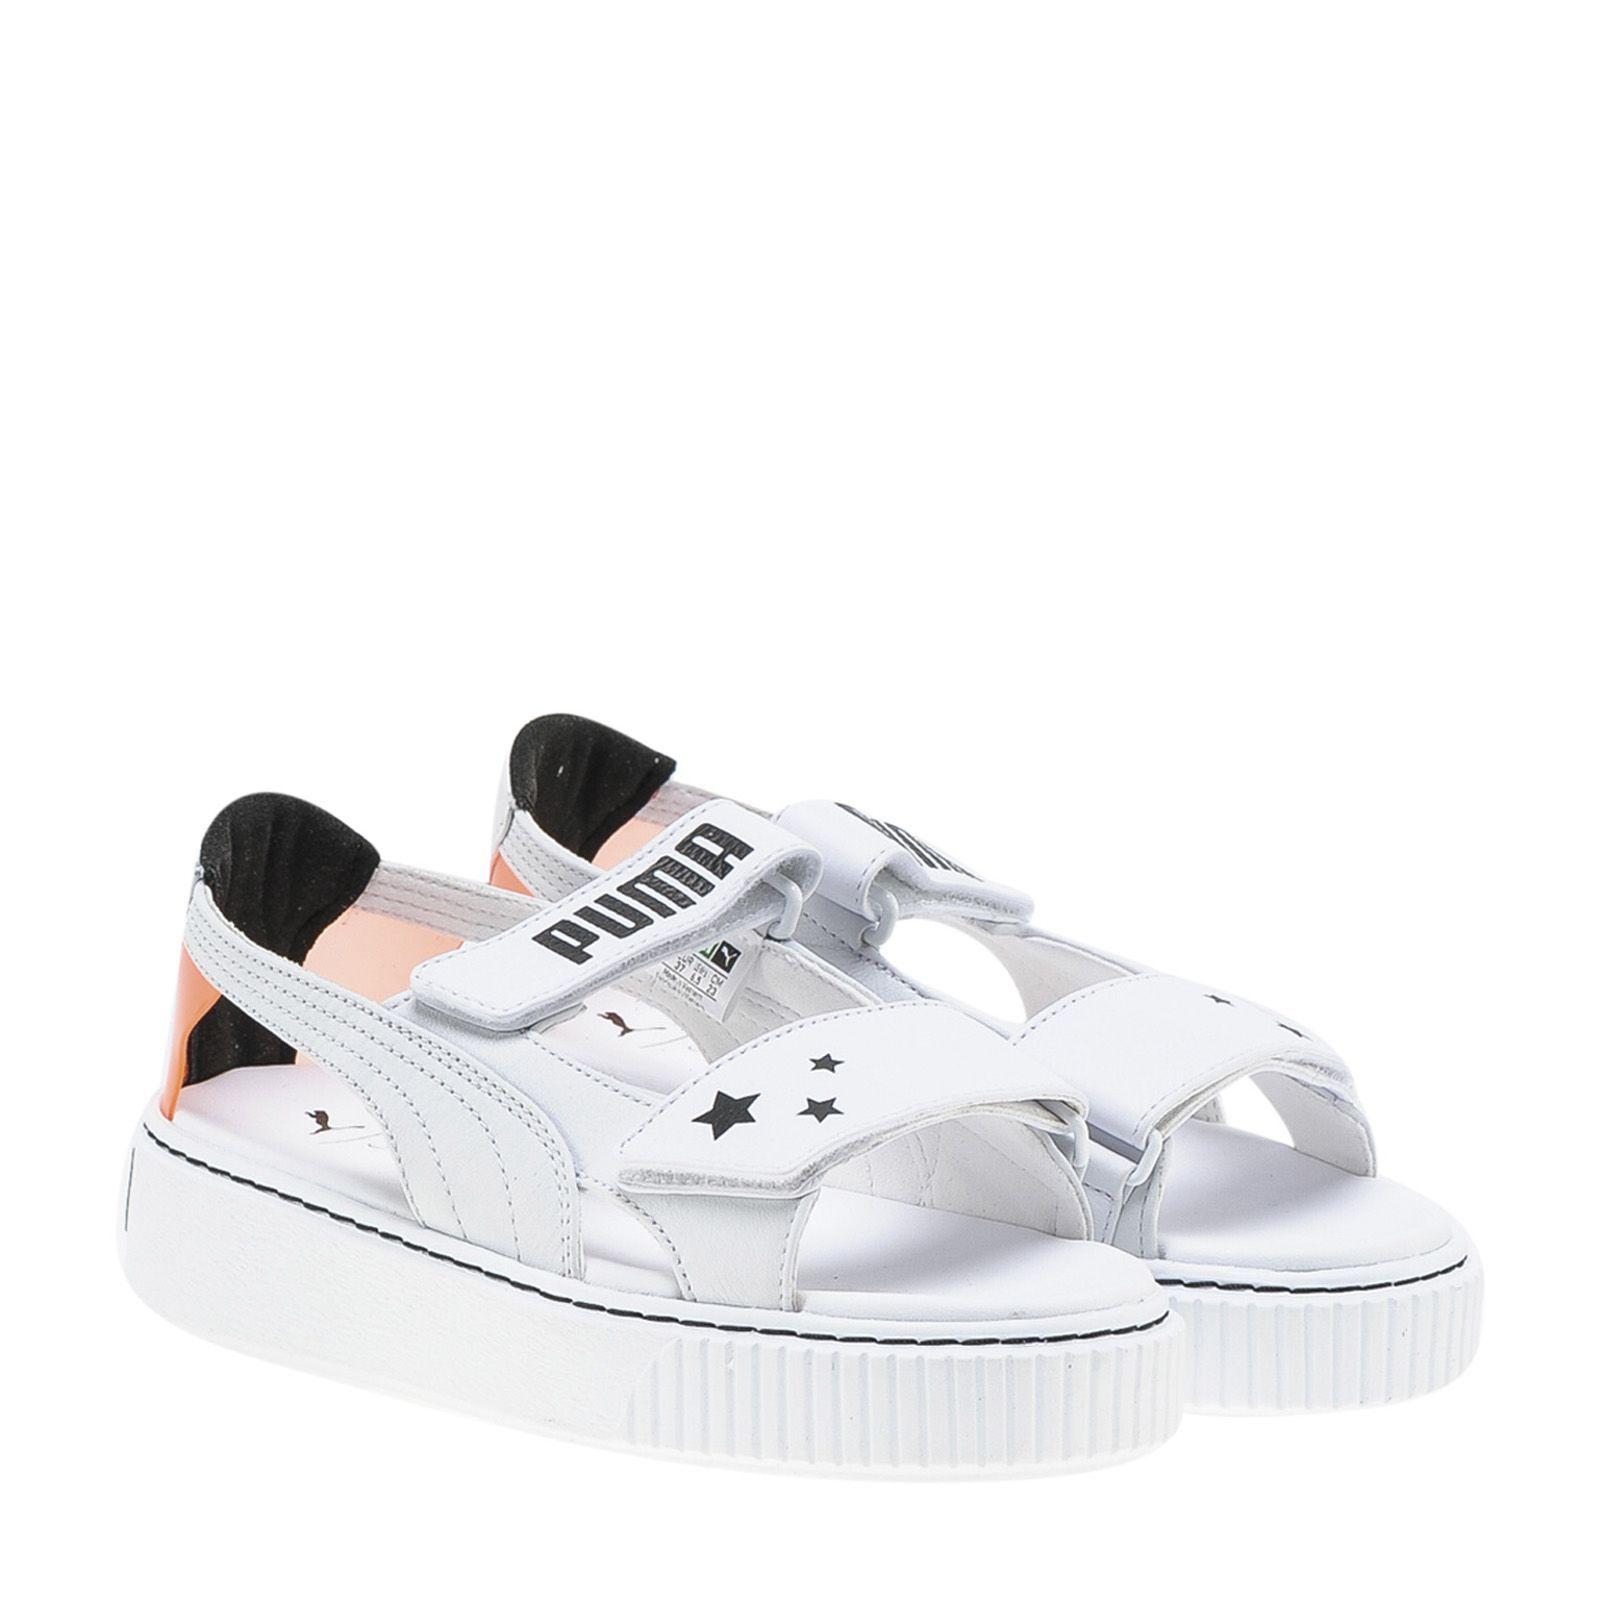 SOPHIA WEBSTER X PUMA PUMA X SOPHIA WEBSTER OPEN TOE STRAP SNEAKERS.   sophiawebsterxpuma  shoes   7791b851a